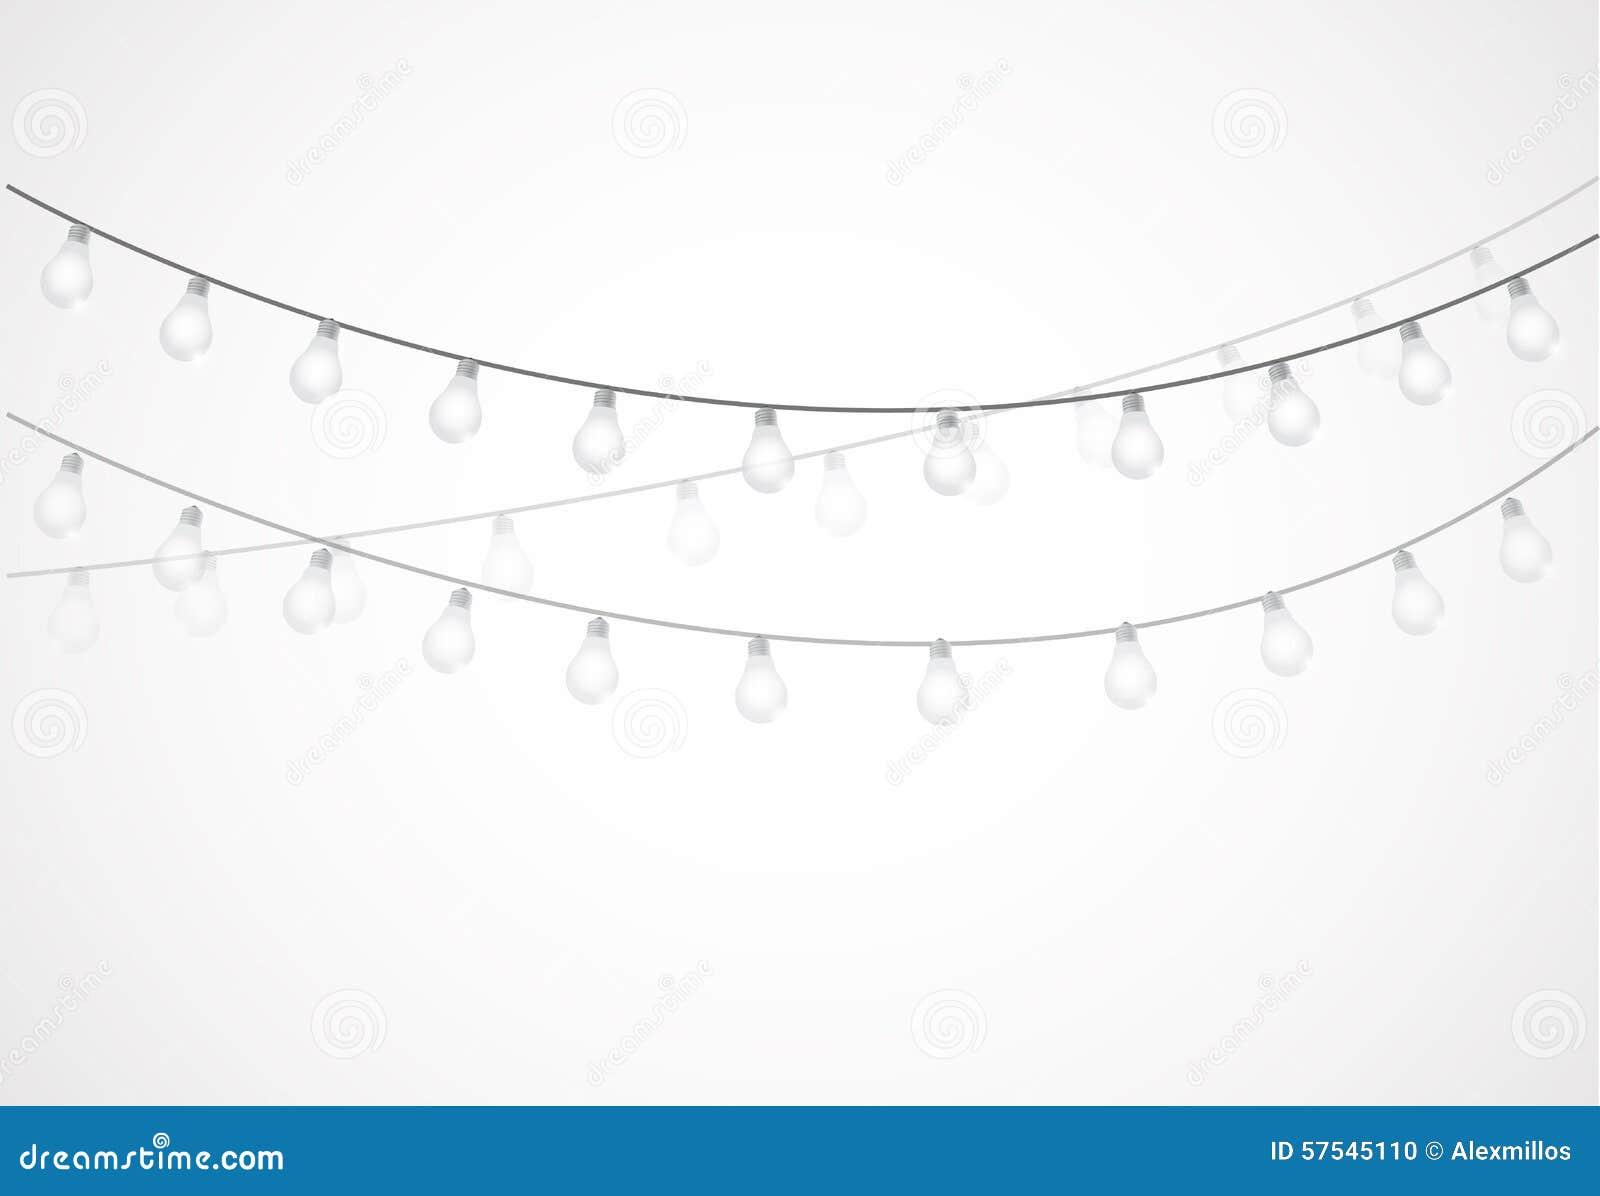 String Of Lights Hanging Light Bulbs Stock Illustration